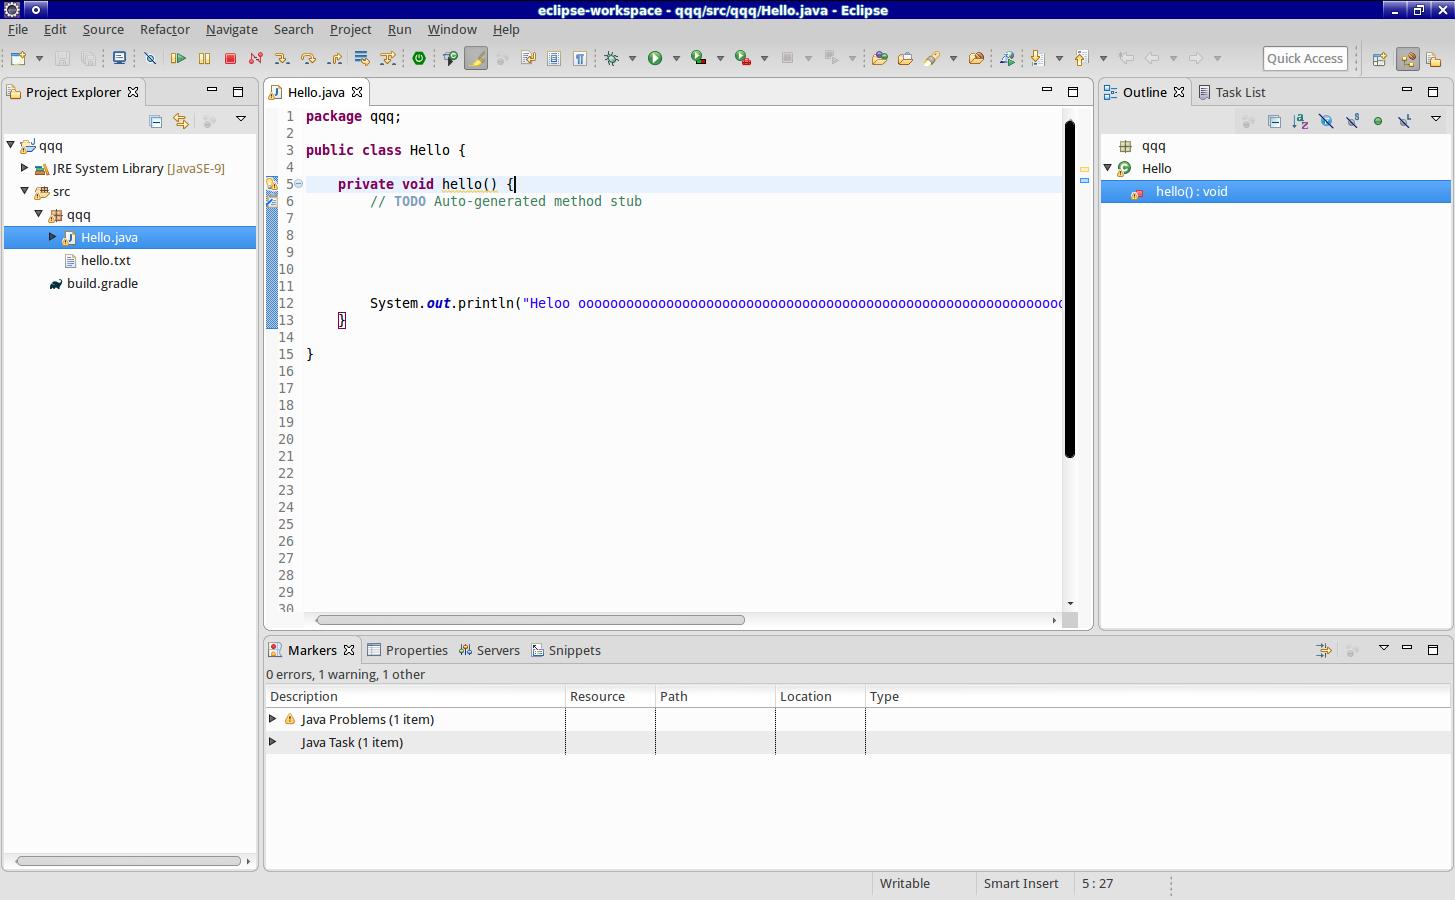 530693 – [GTK2] Editor redrawn incorrectly on horizontal